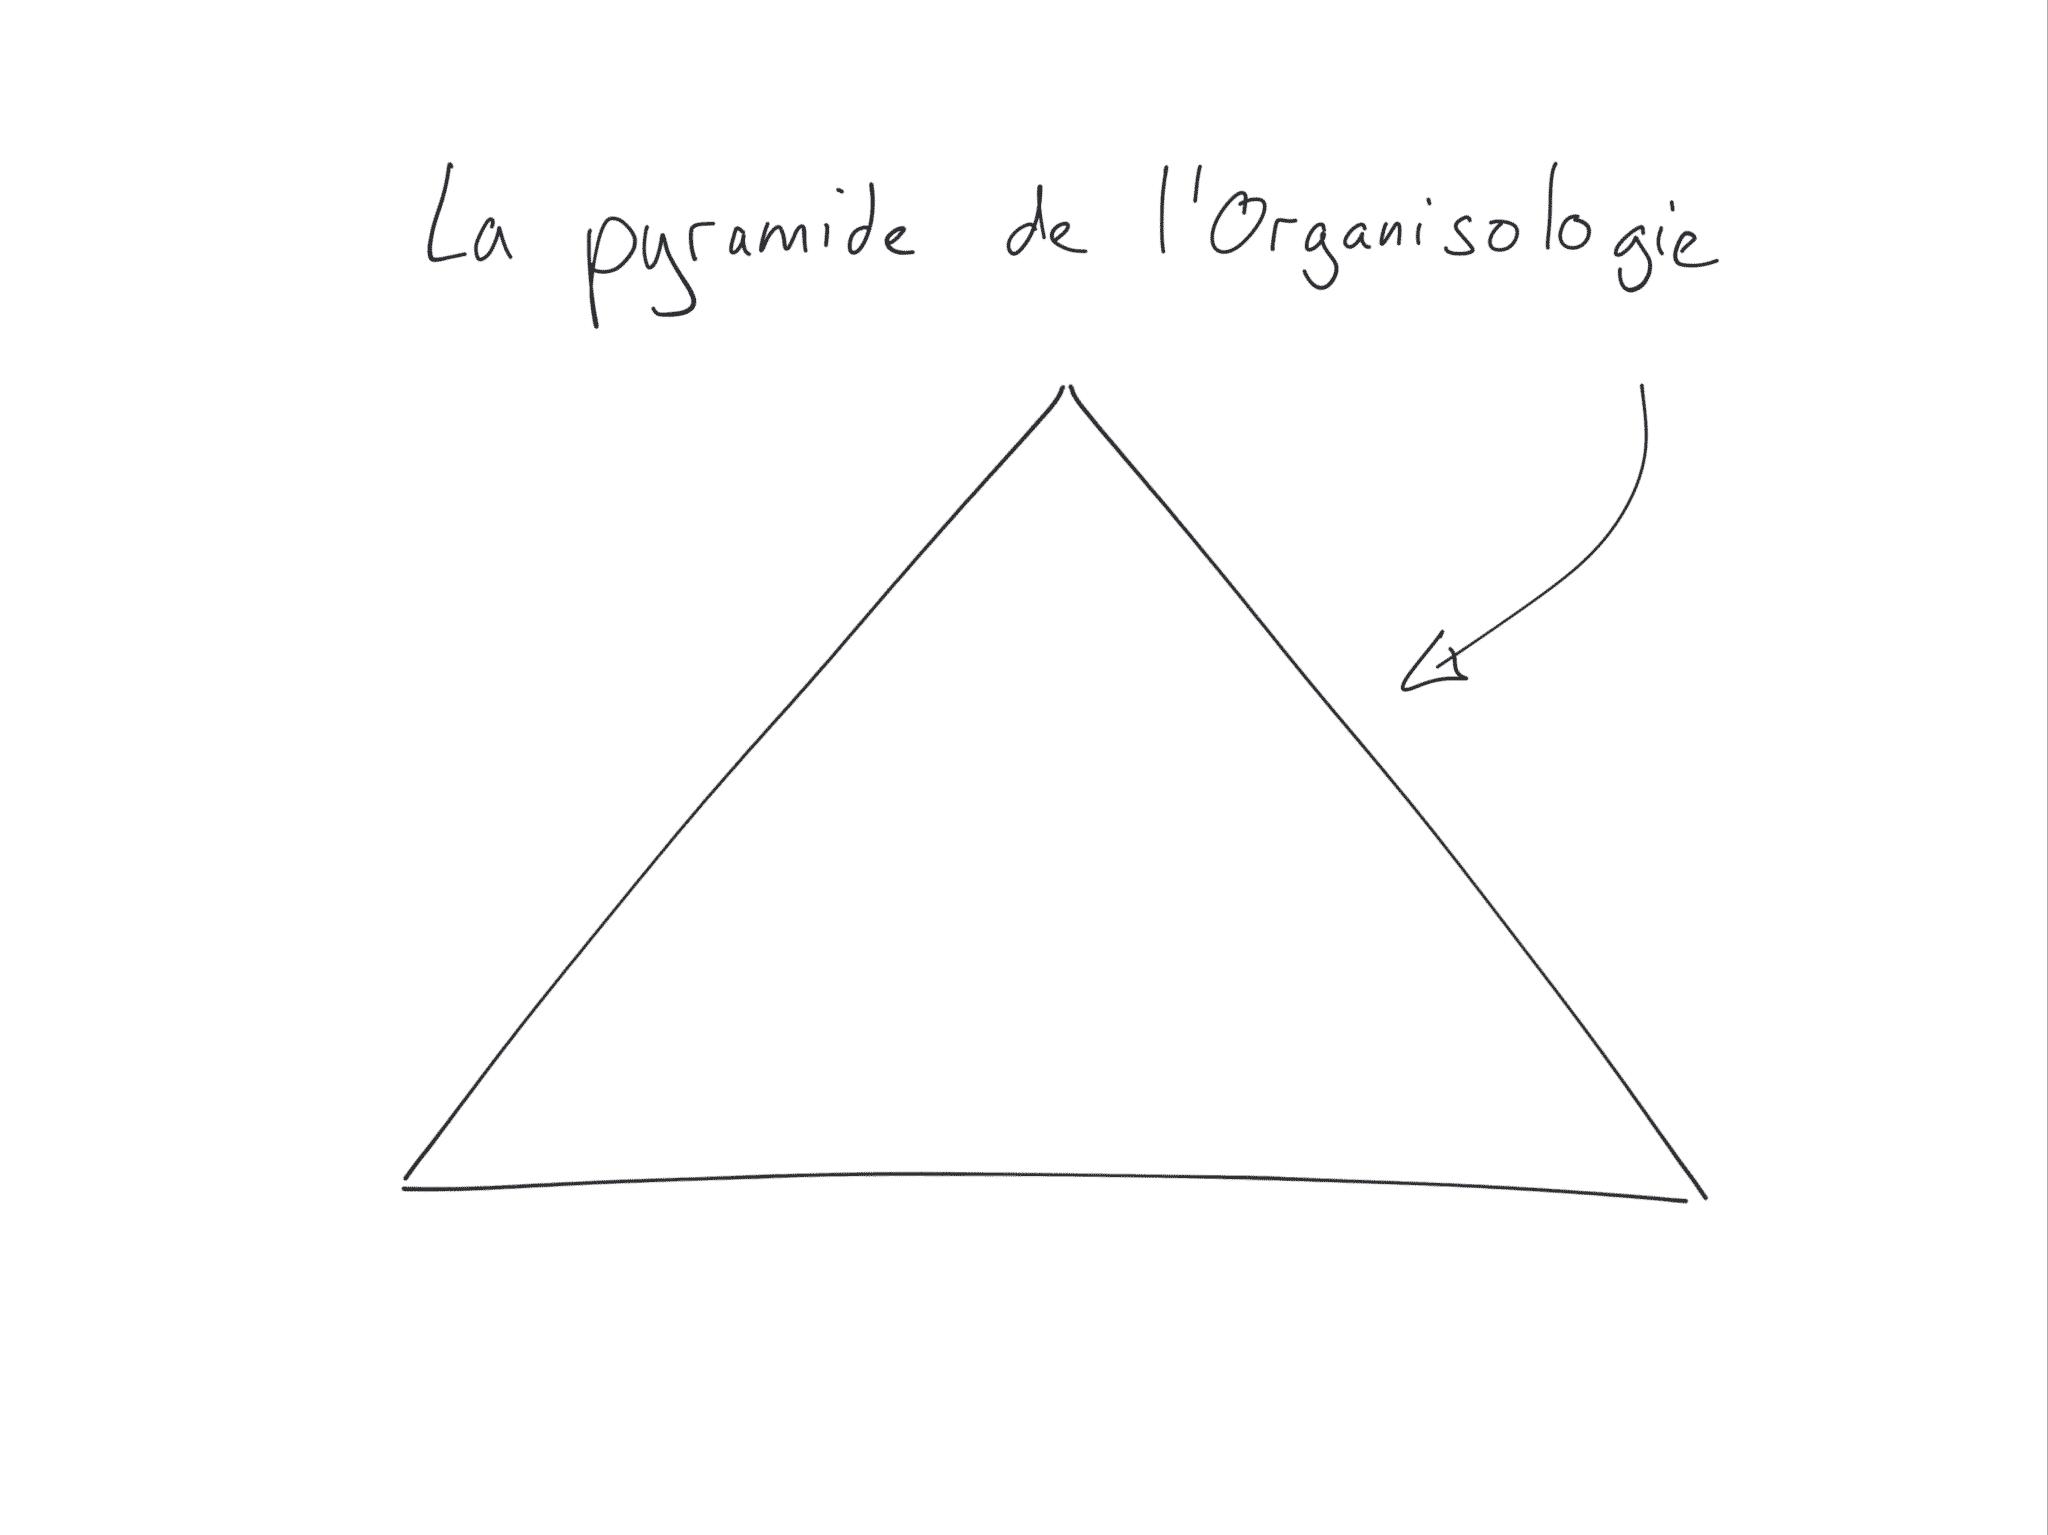 La pyramide de l'organisologie